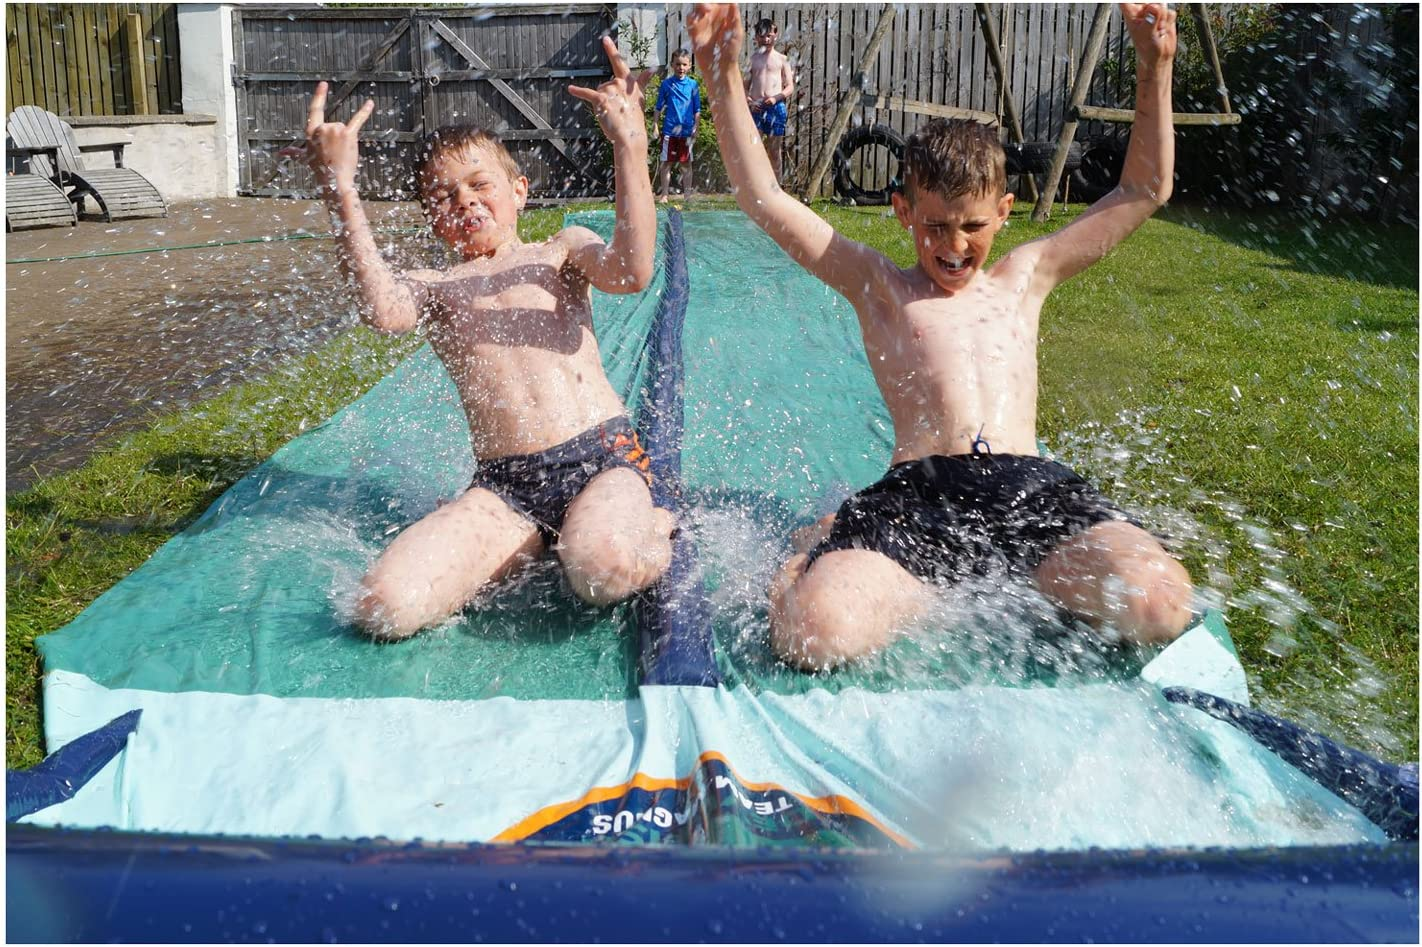 Garten Gadget: Wasserrutsche XXL